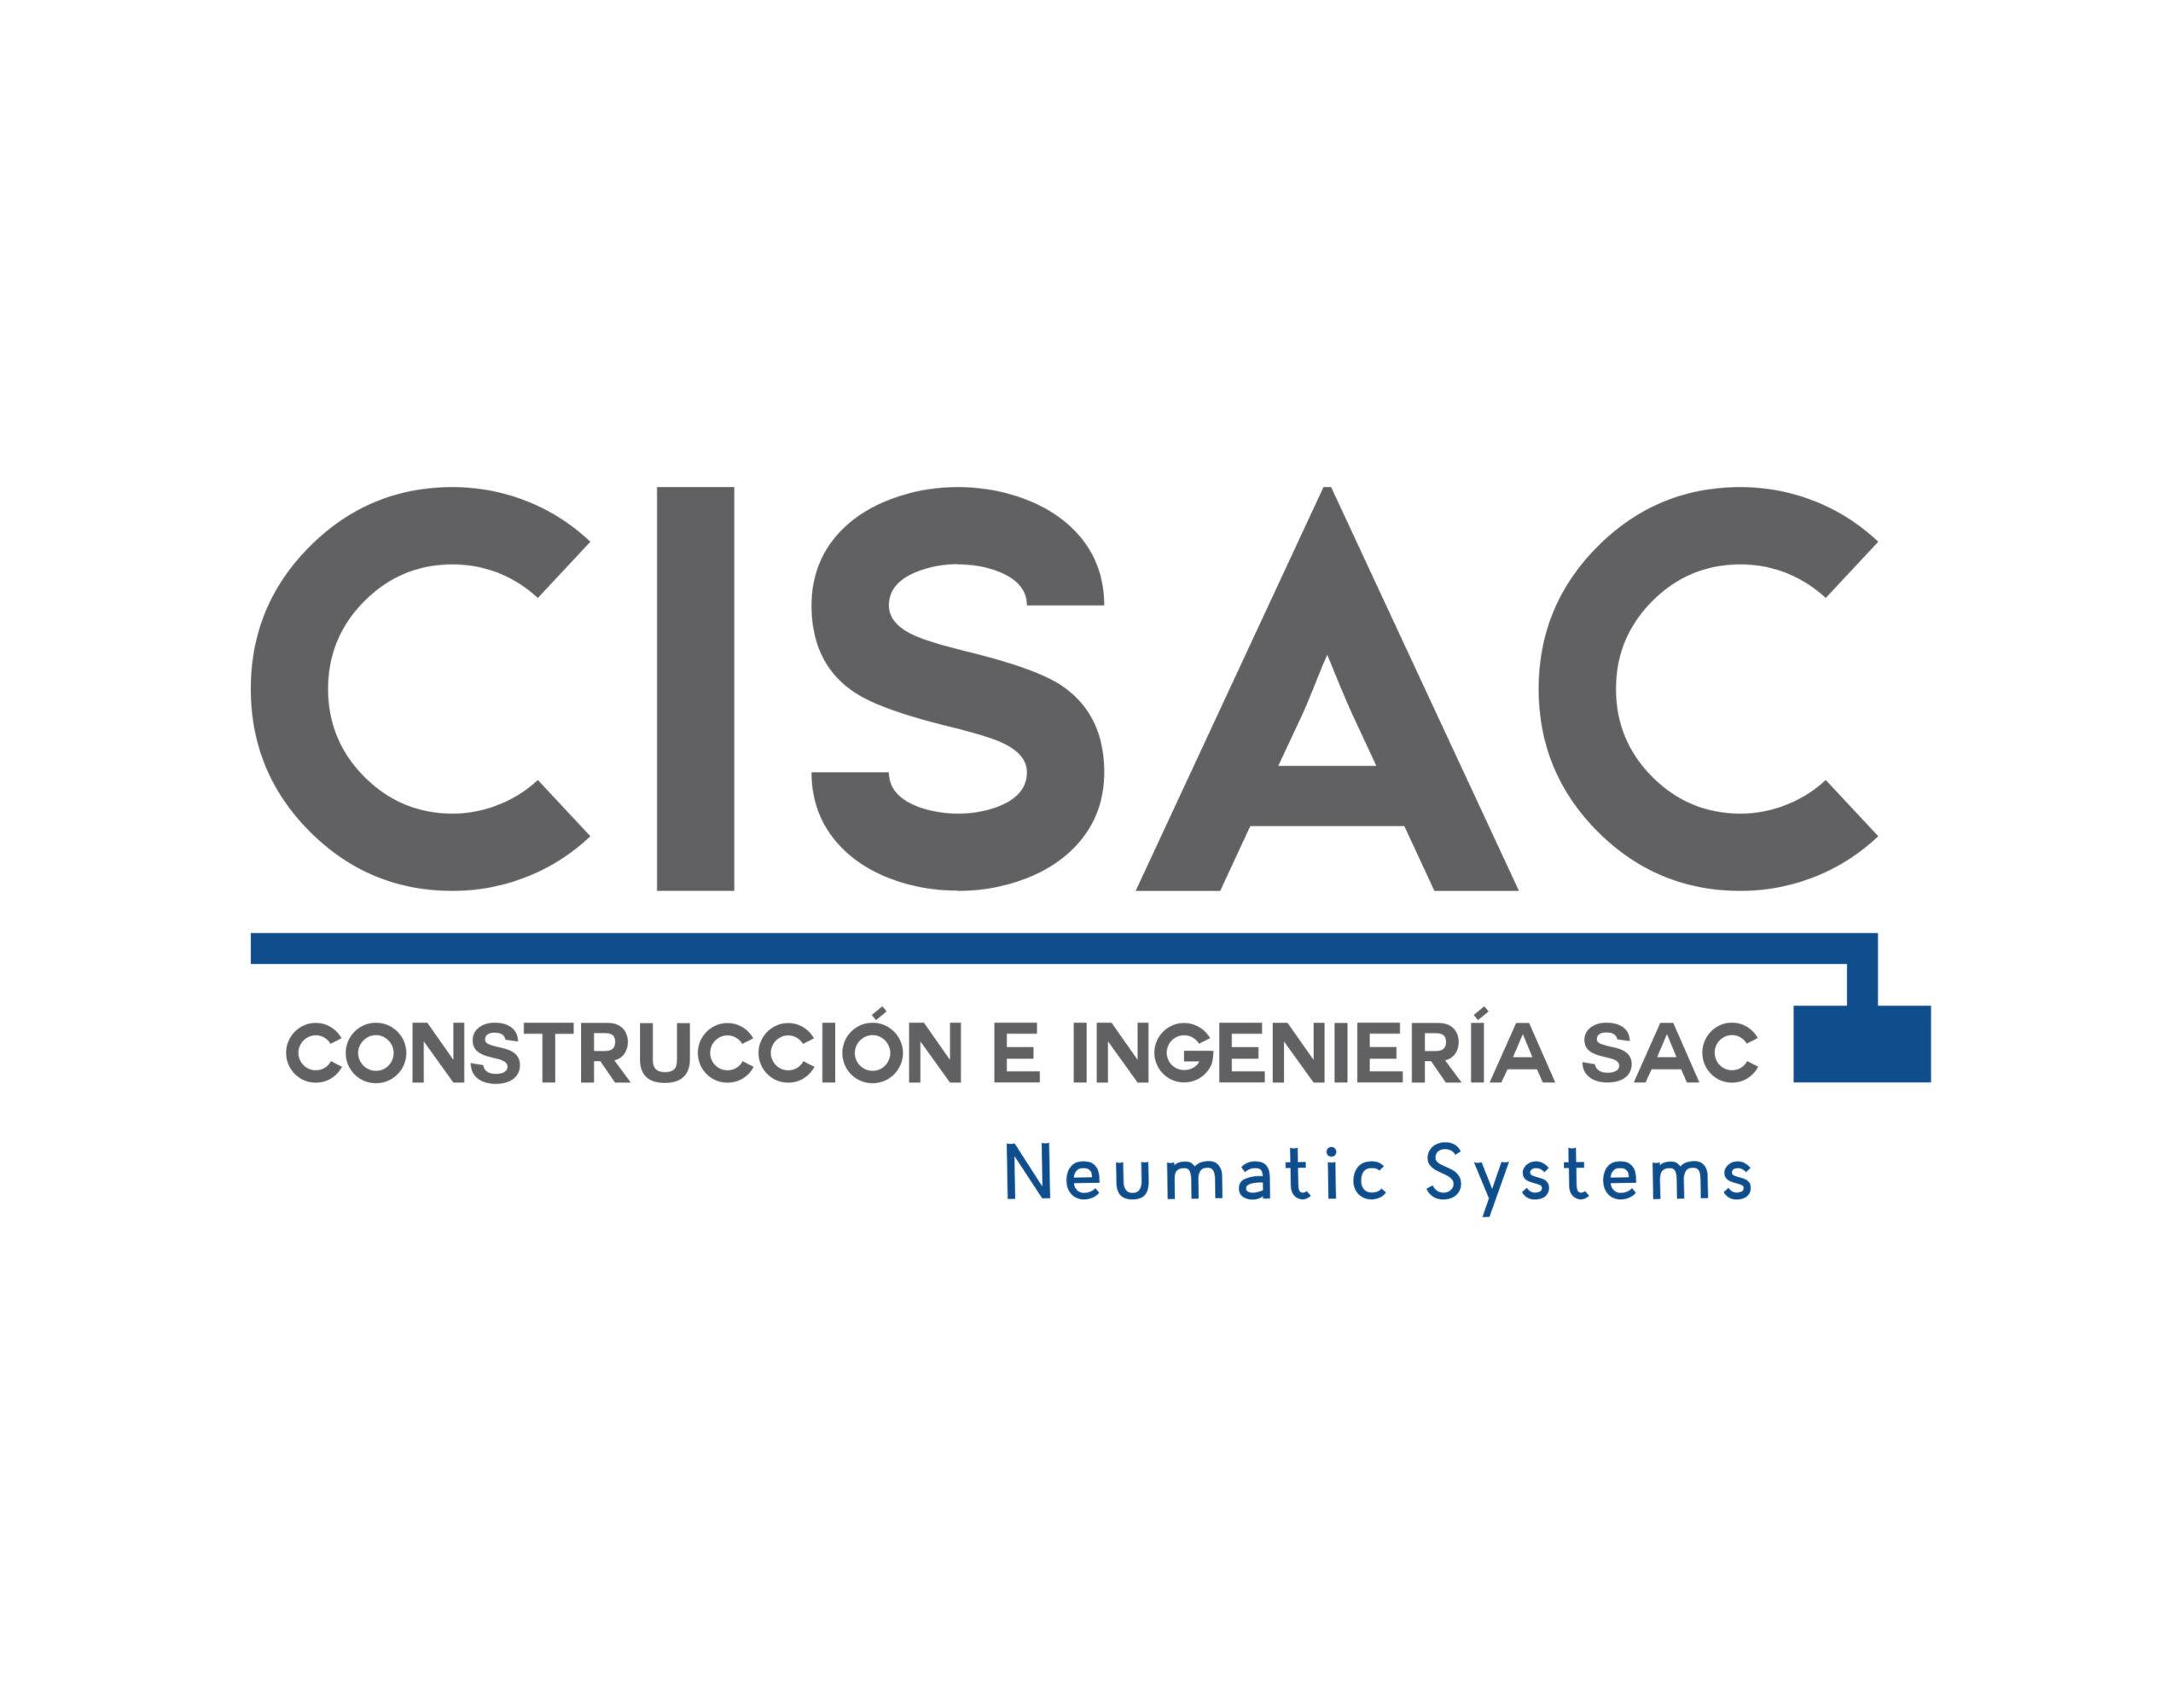 CISAC-RGB-COLOR